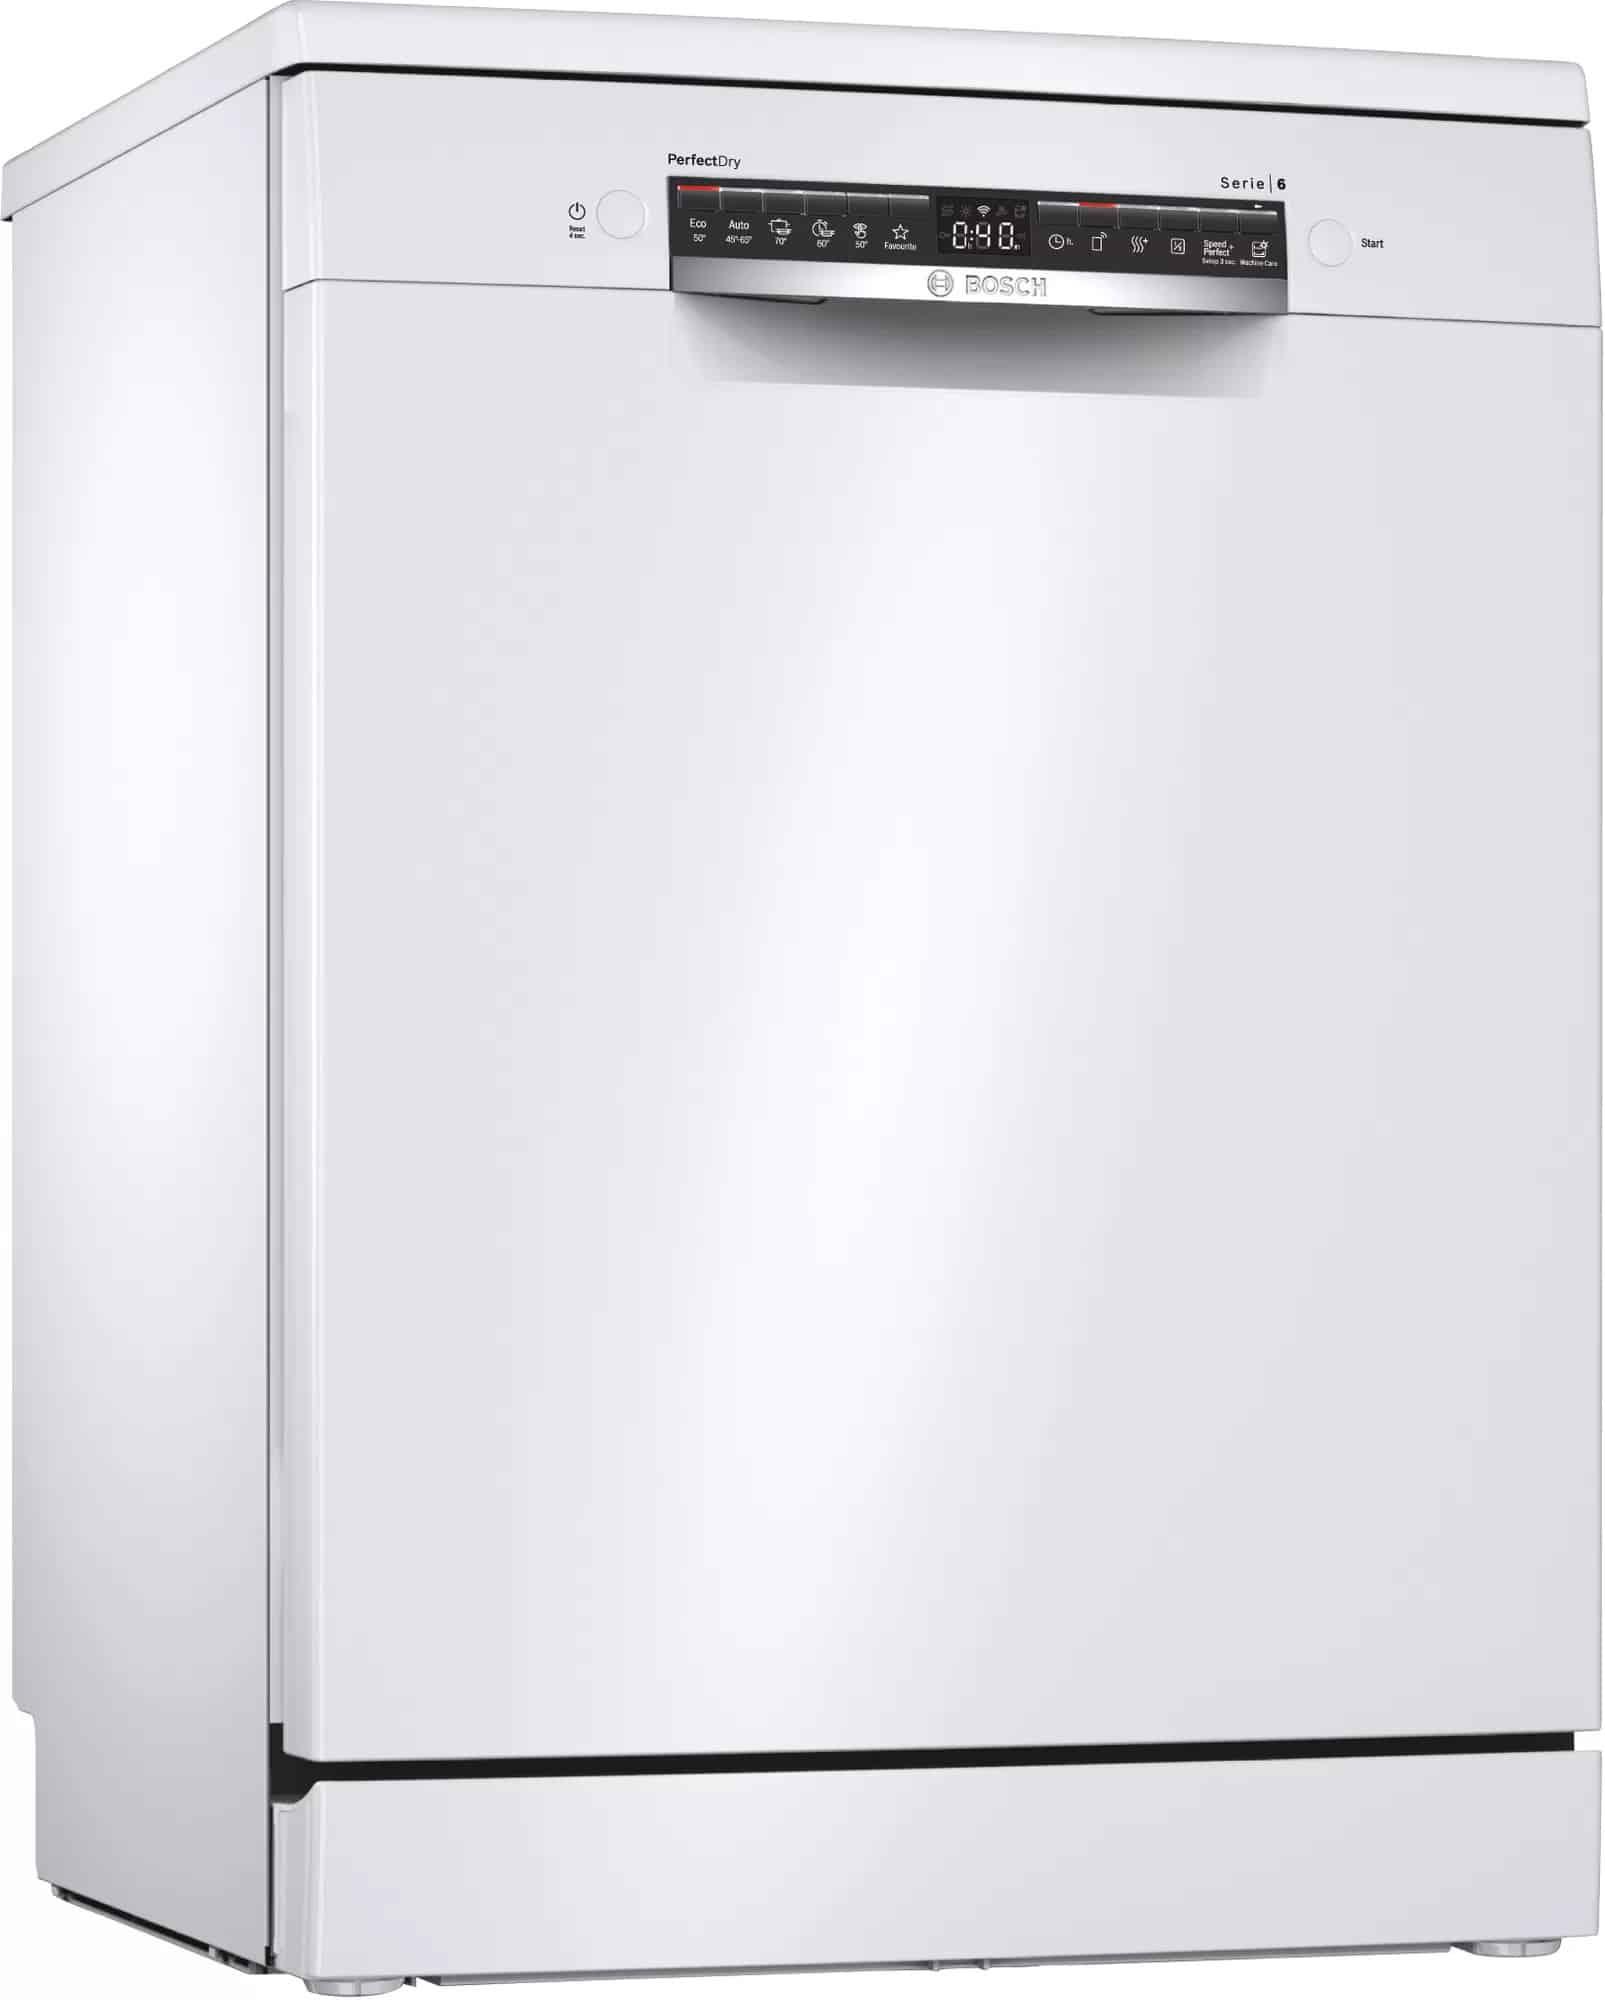 Máy rửa bát độc lập Bosch SMS6ZCW00E Serie 6 (2021)